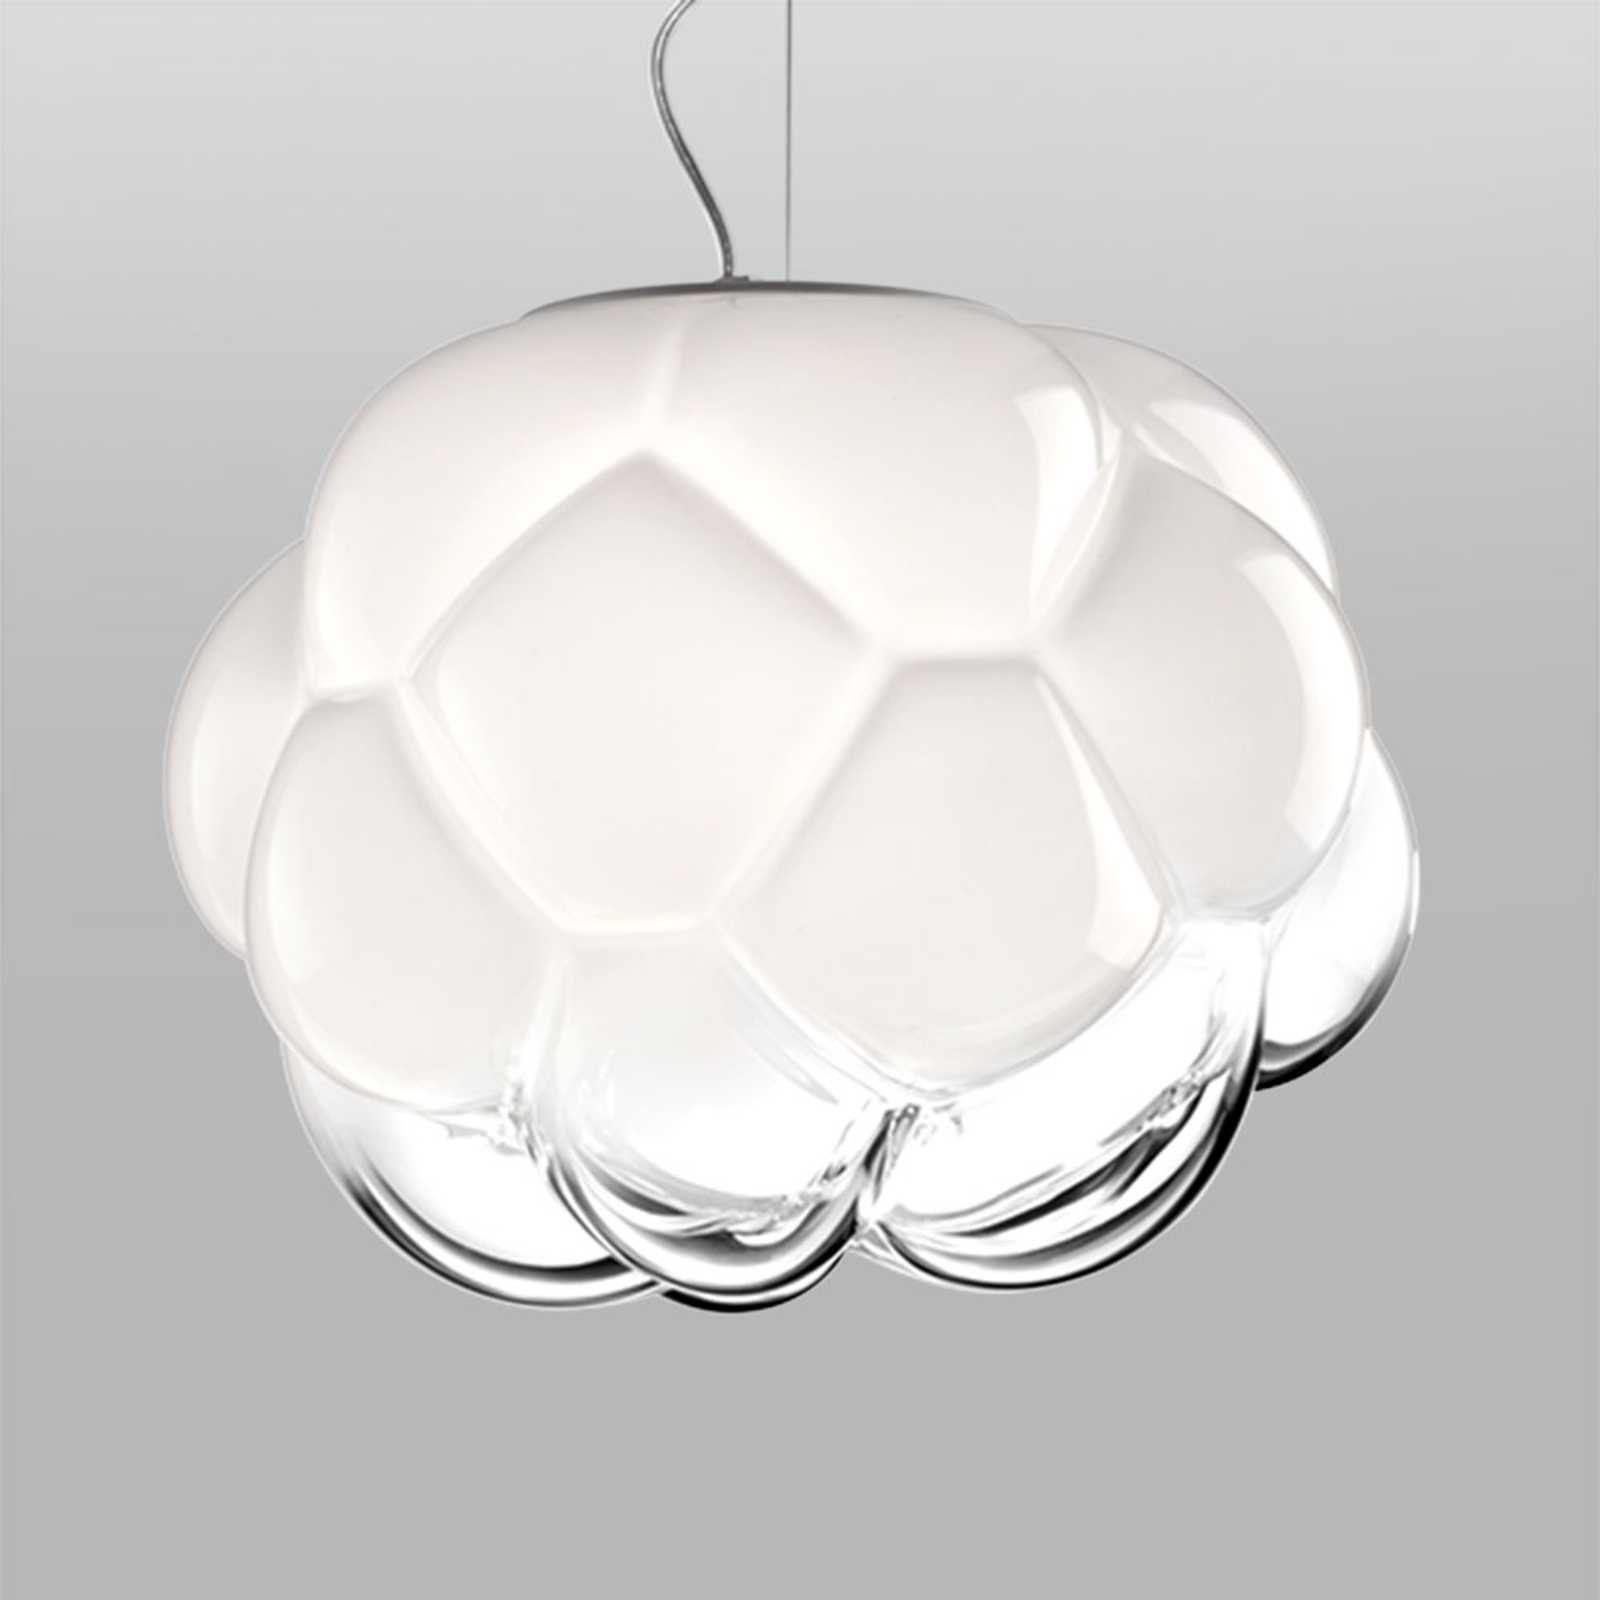 Fabbian Cloudy - LED-Hängeleuchte Wolkenform 40 cm